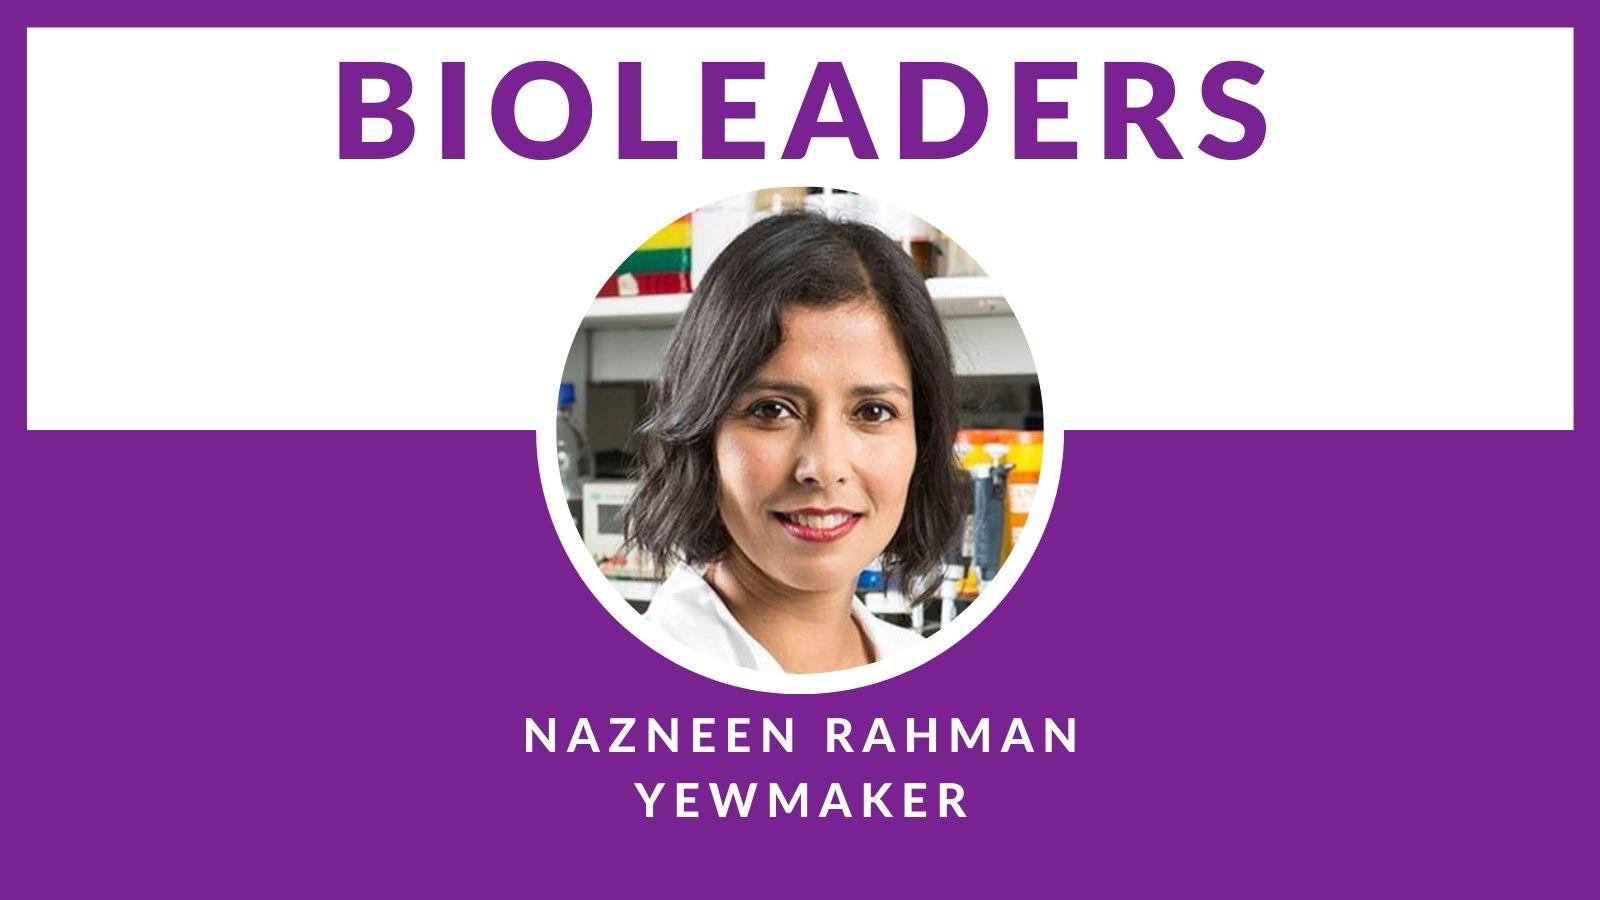 BioLeader Interviewee Nazneen Rahman